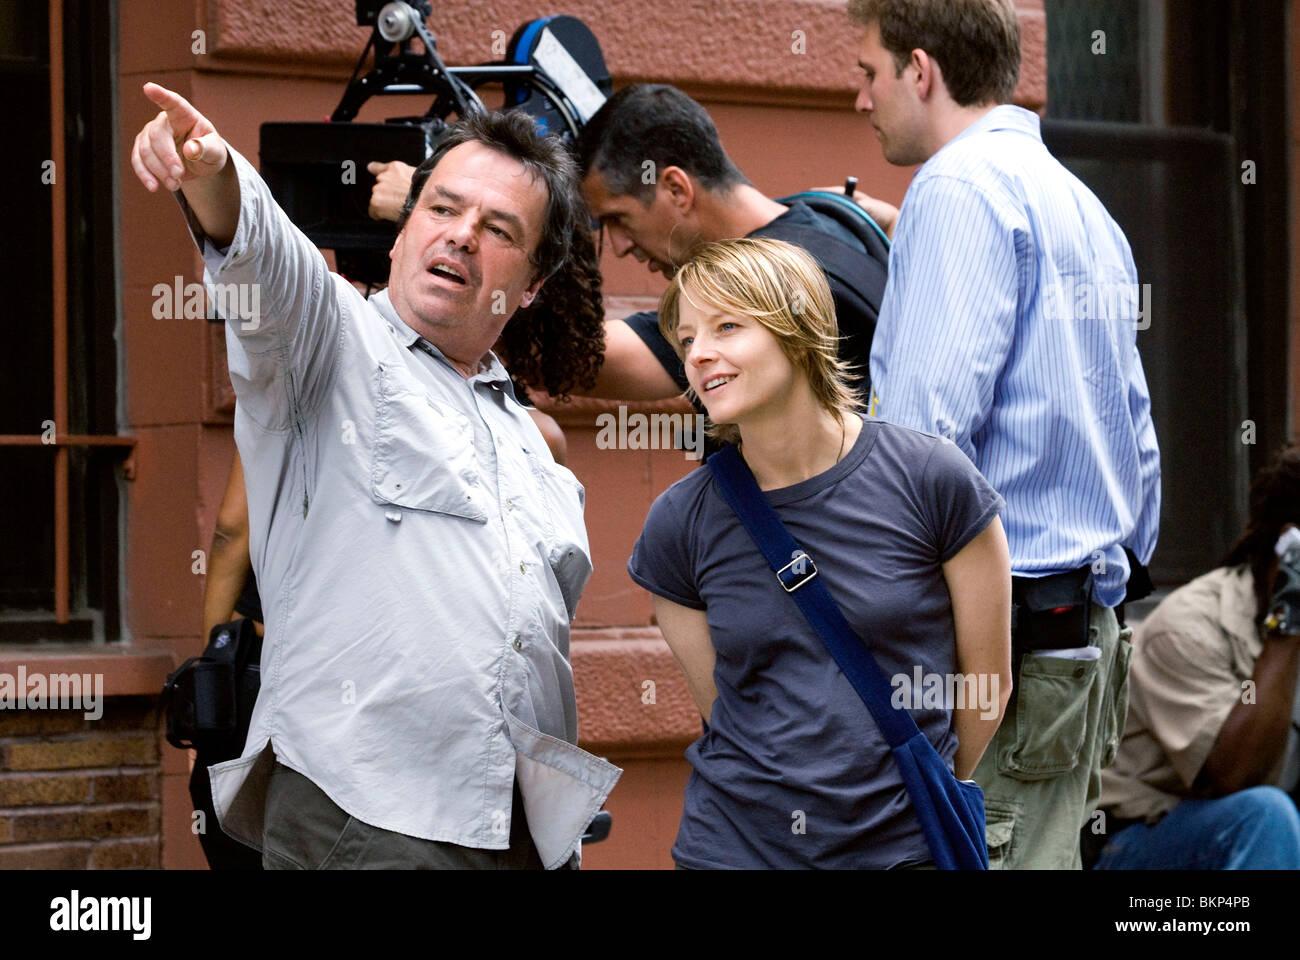 FILMING, O/S 'THE BRAVE ONE (2007)' NEIL JORDAN (DIR), JODIE FOSTER BRAV 032 - Stock Image